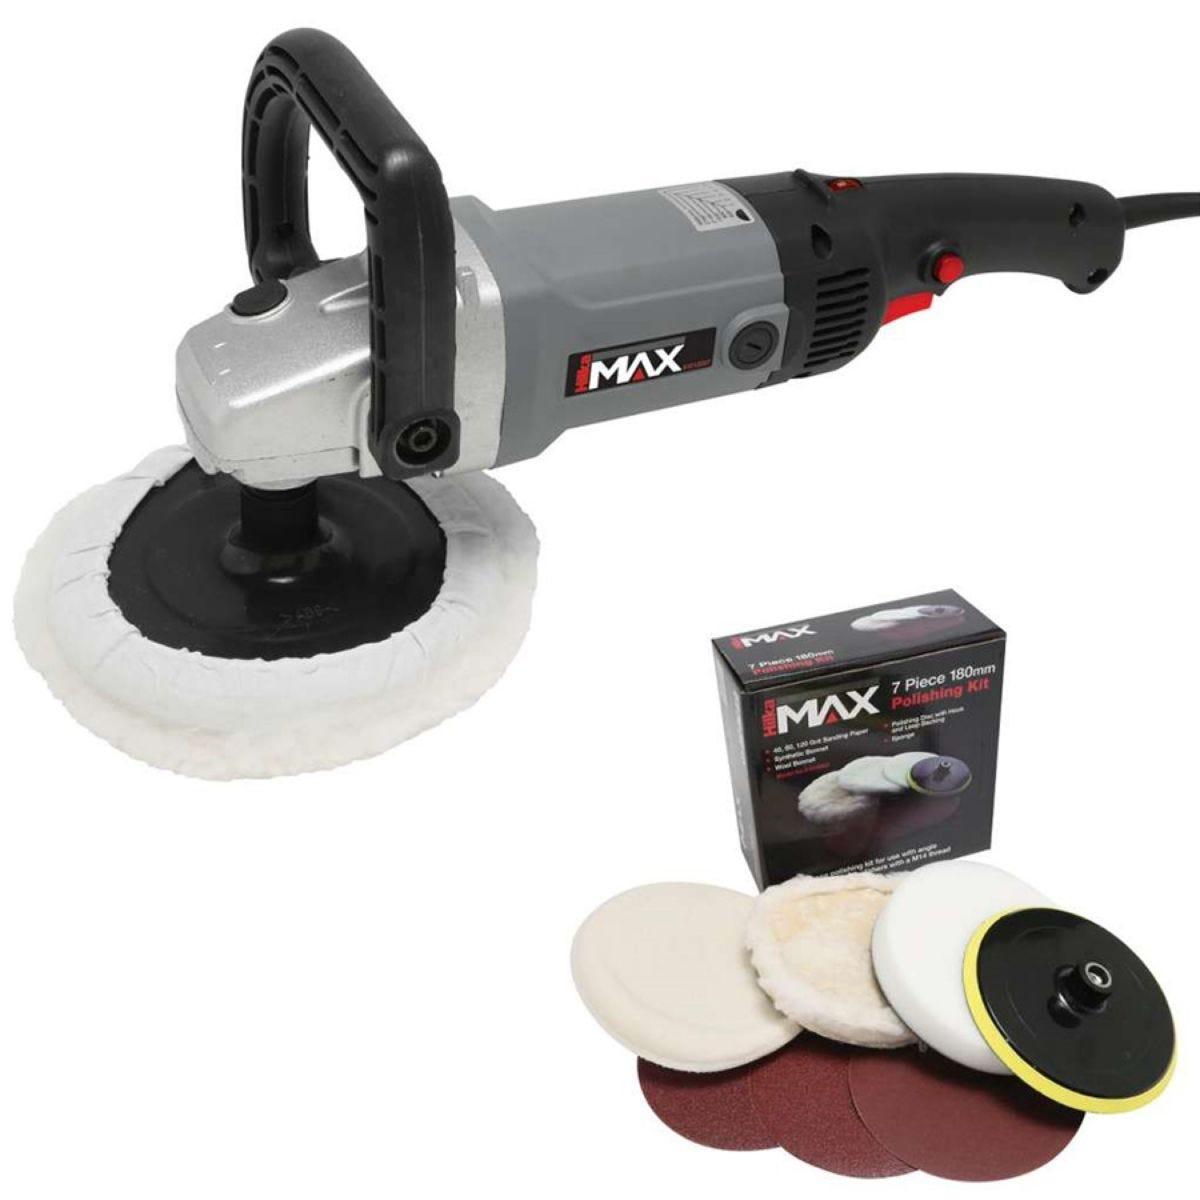 Hilka 180mm Sander, Polisher and 7-Piece Polishing Kit